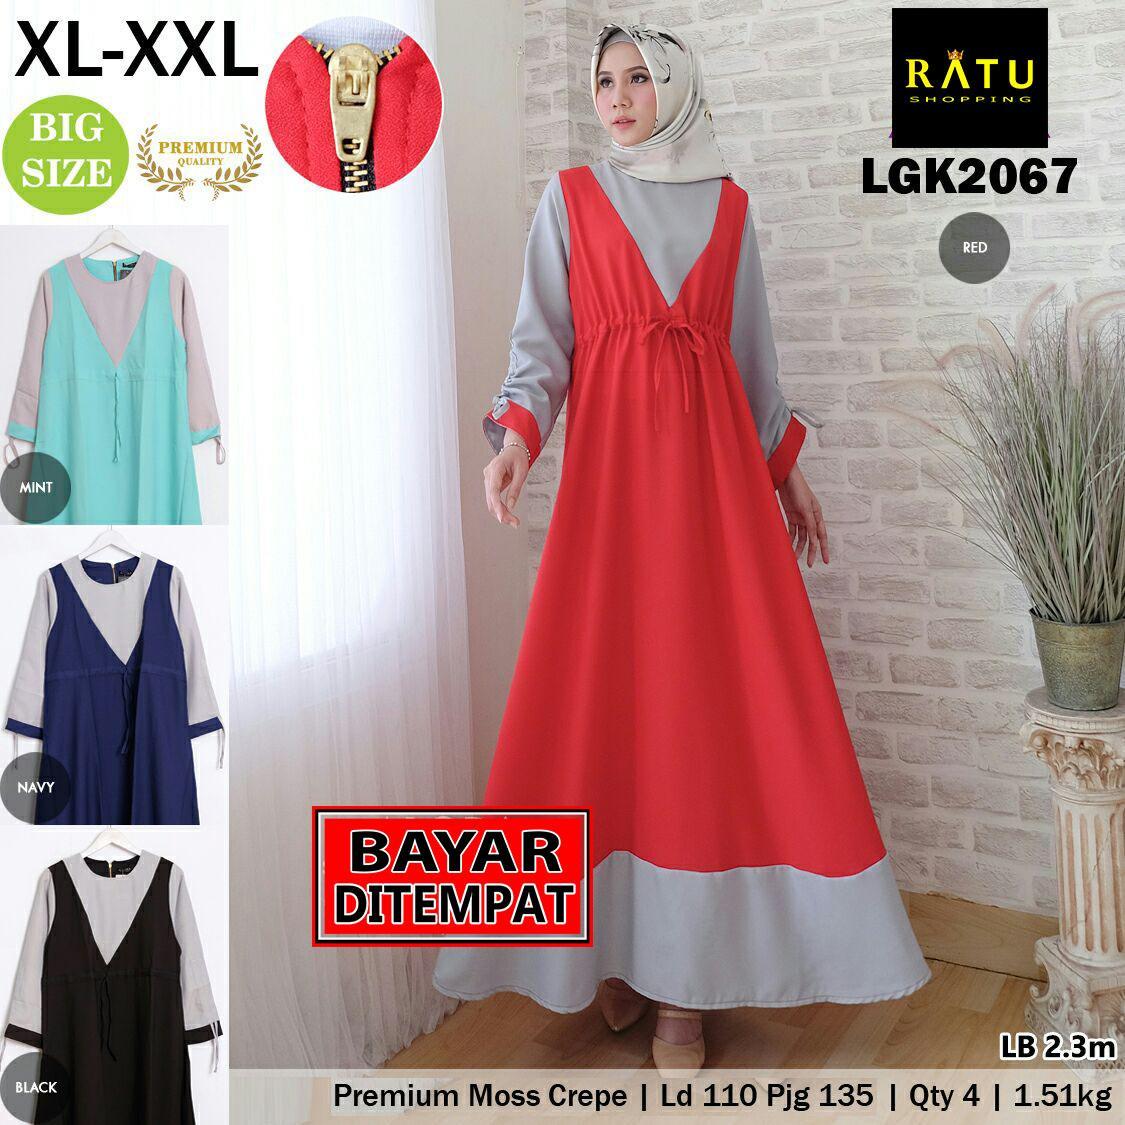 [ RATU SHOPPING ] gamis jumbo xl xxl promo ramadhan baju muslim lebaran jumbo size big size lgk2067